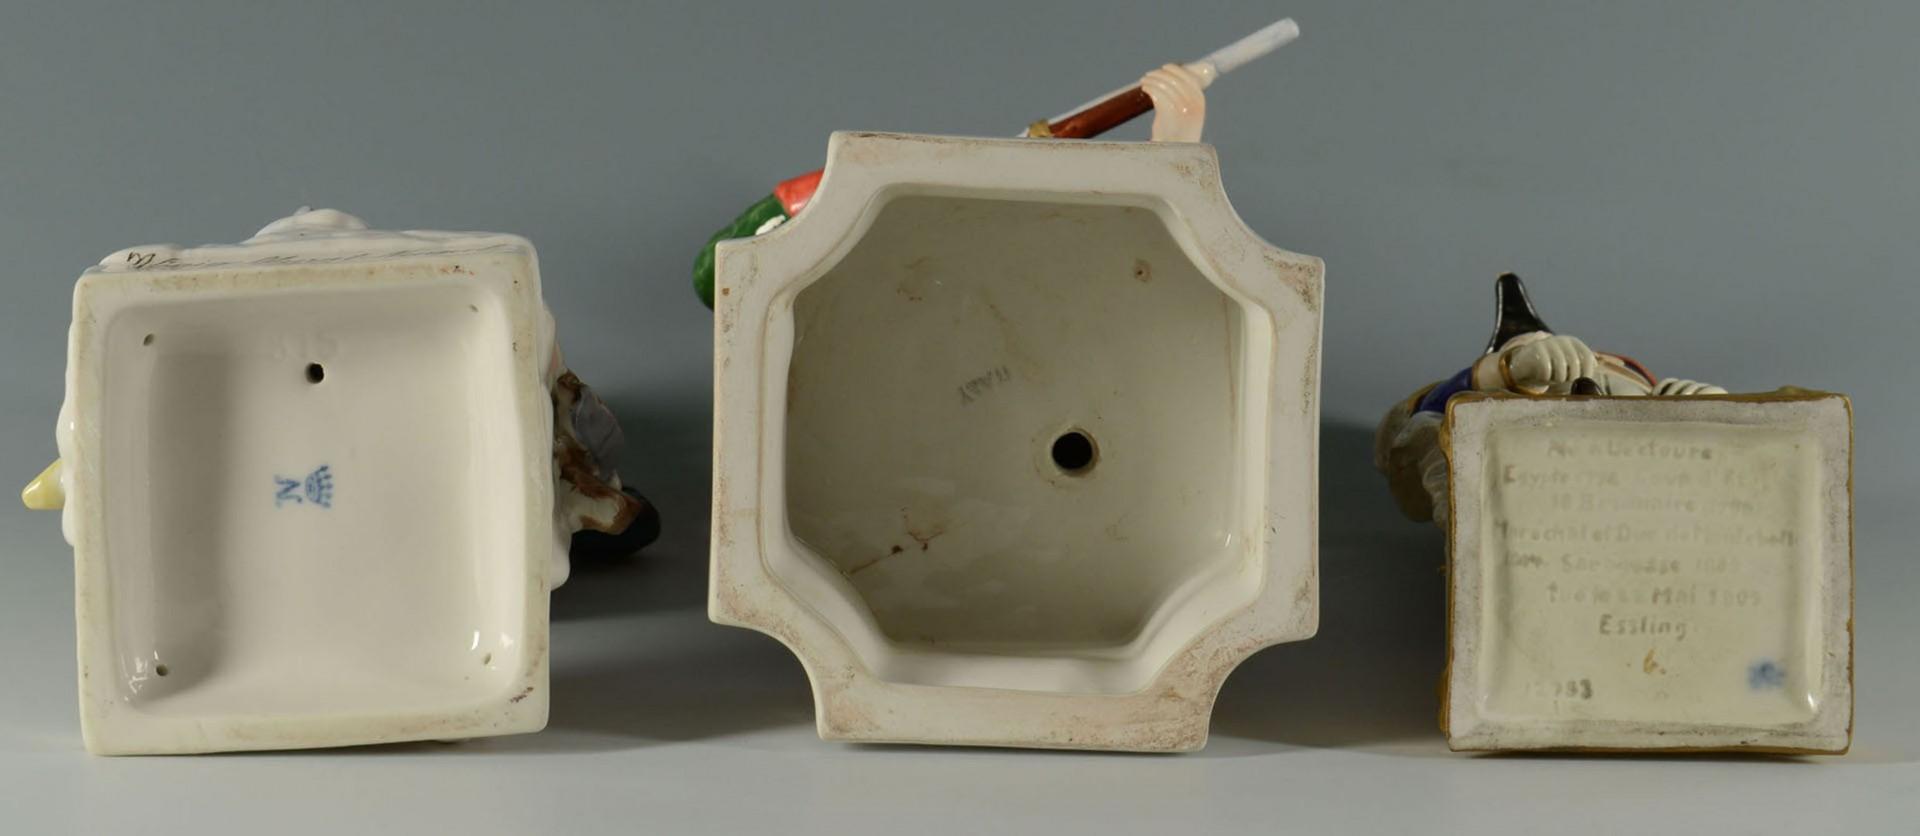 Lot 2872343: Group of 3 European Porcelain Figures